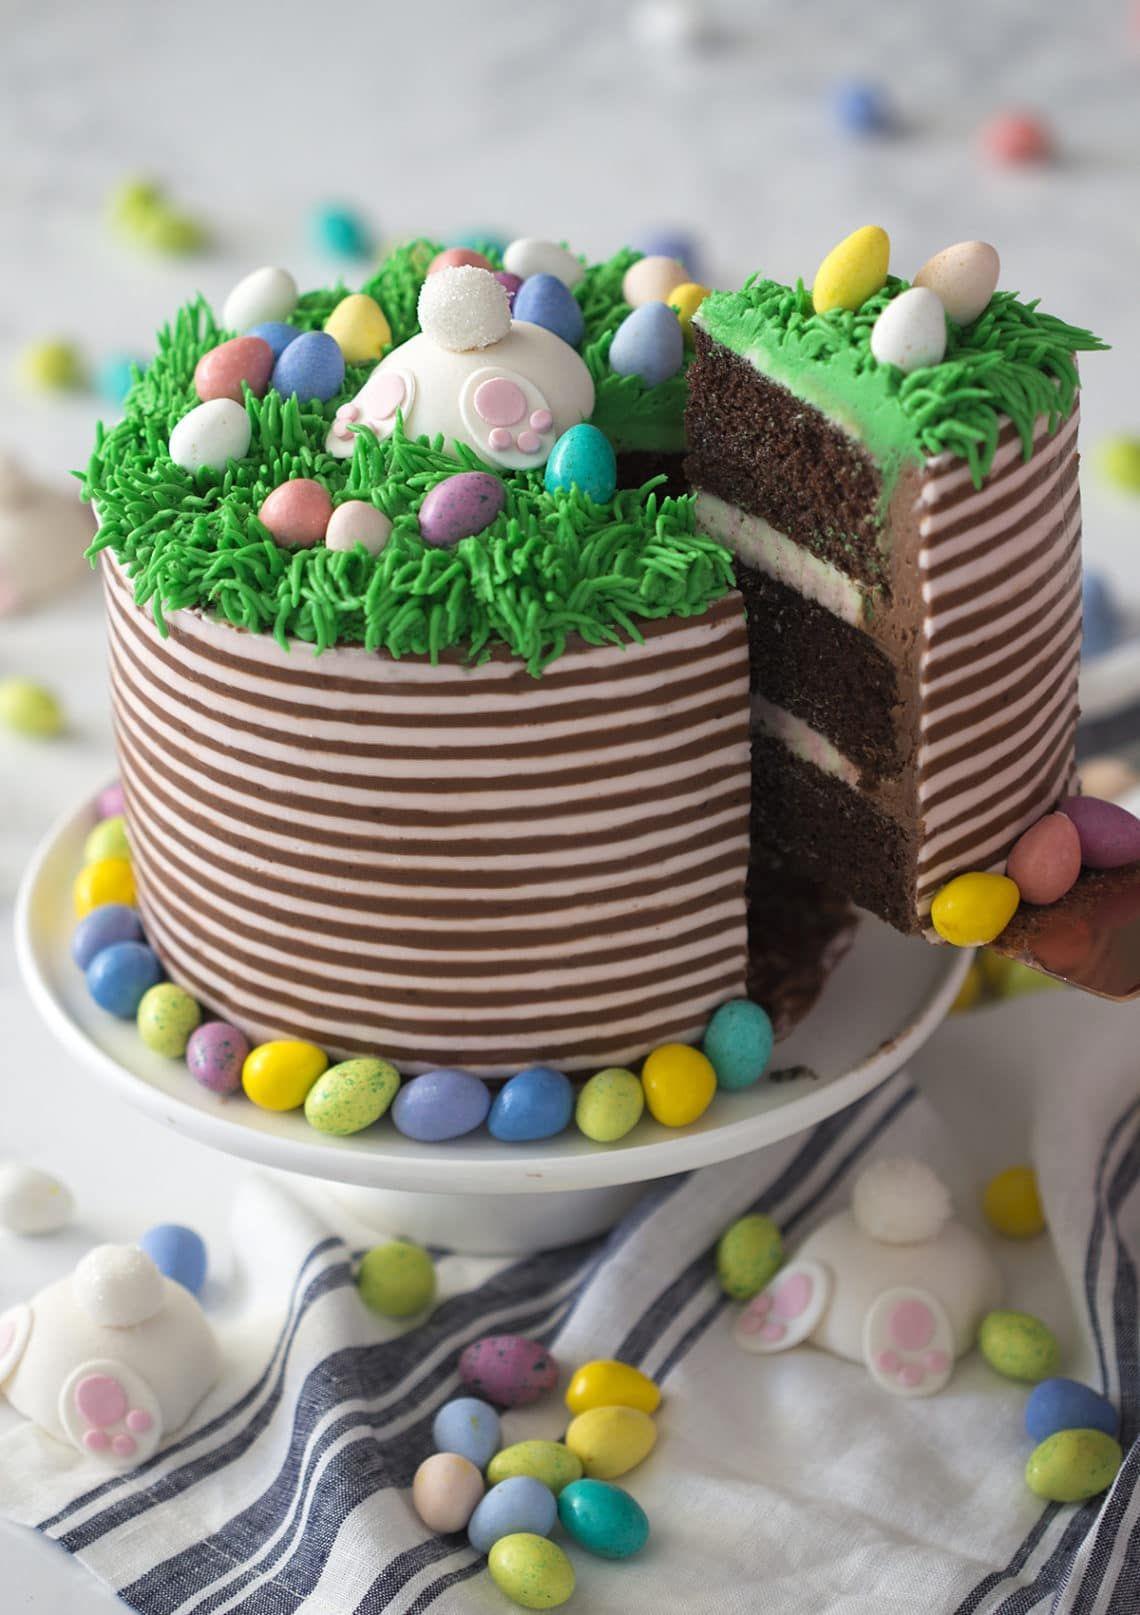 14 Cute Easter Bunny Cake Ideas